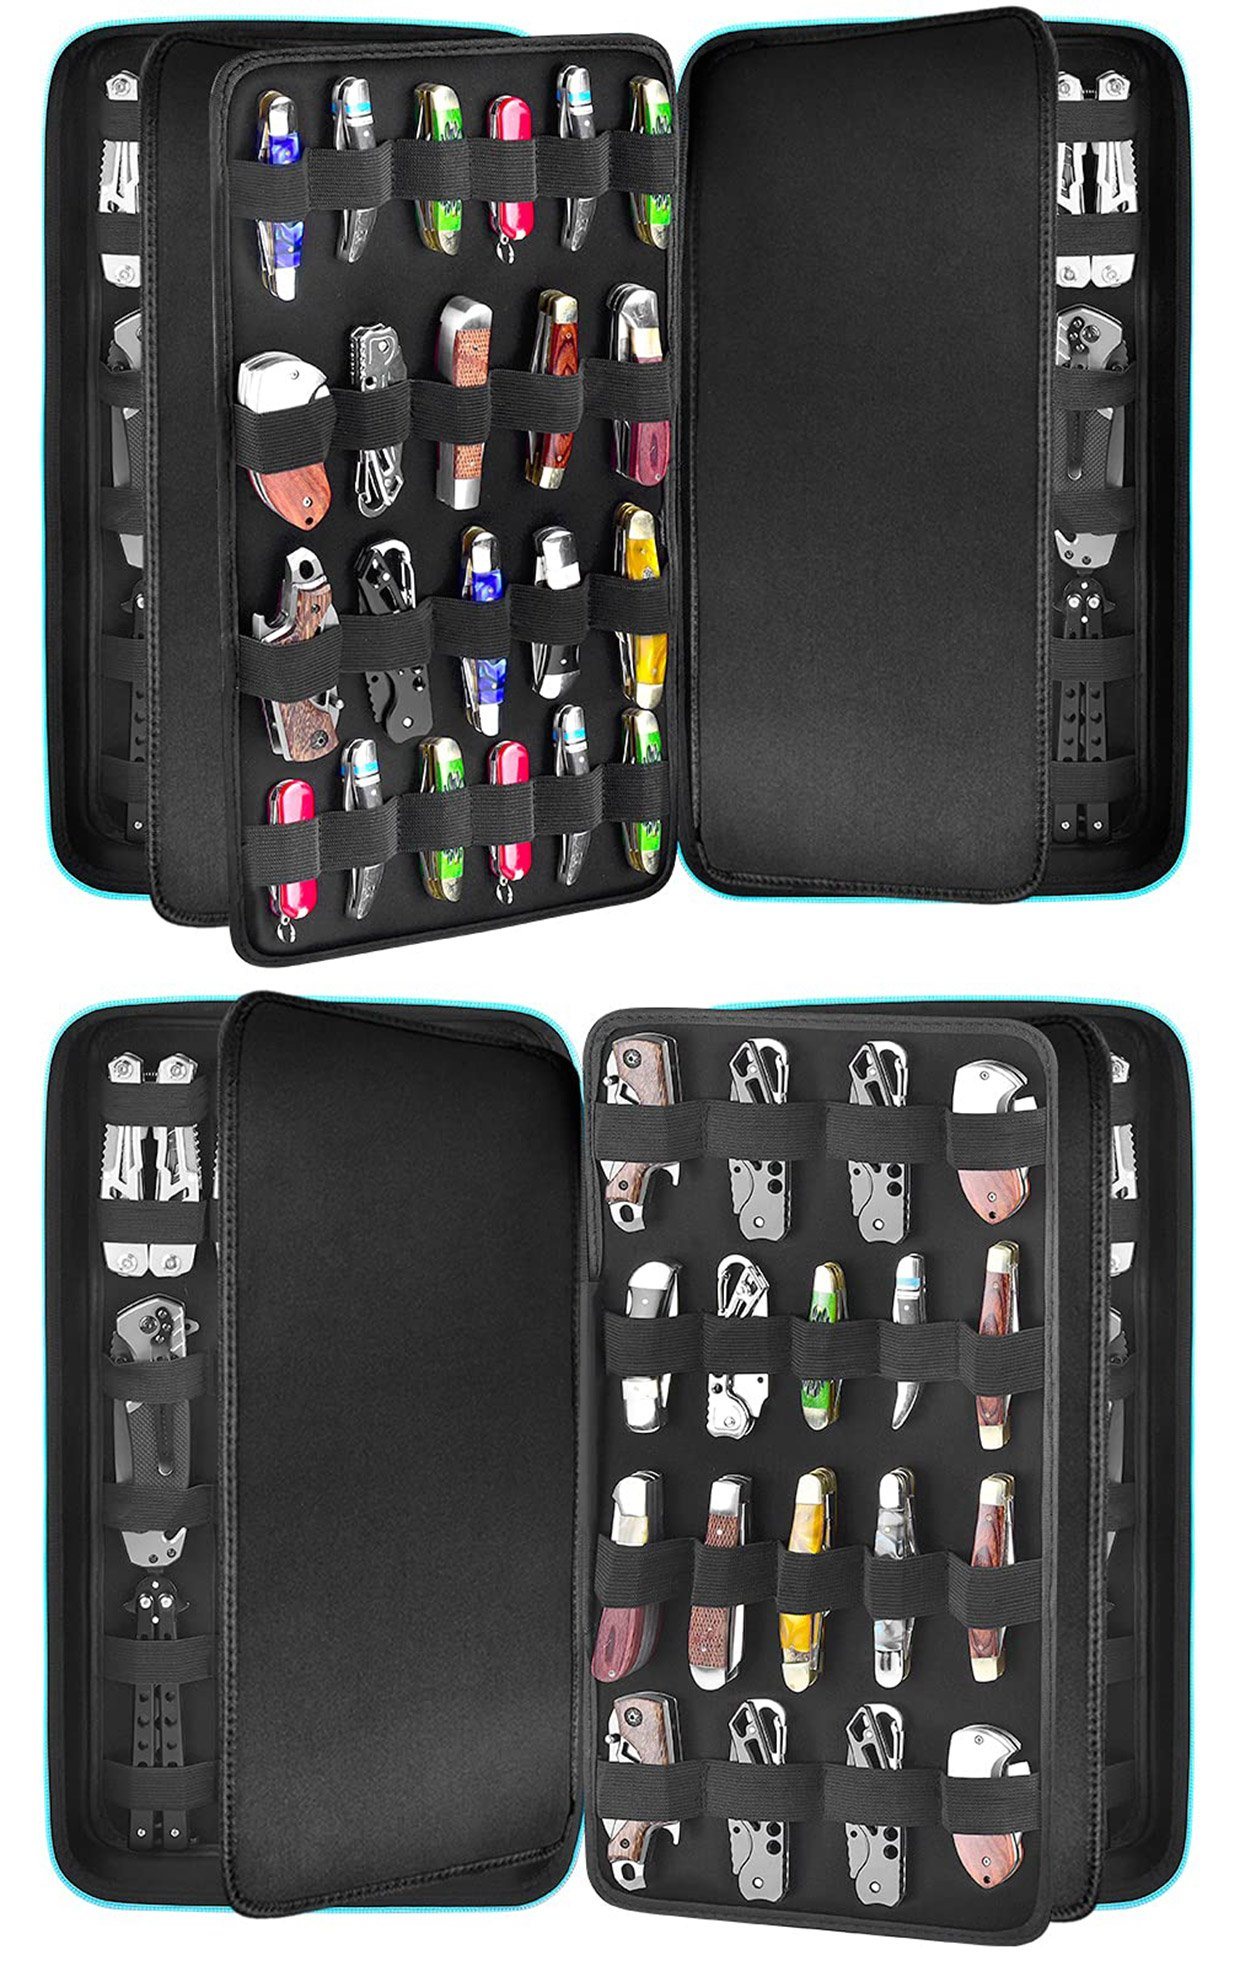 Knife Organizer + Display Case